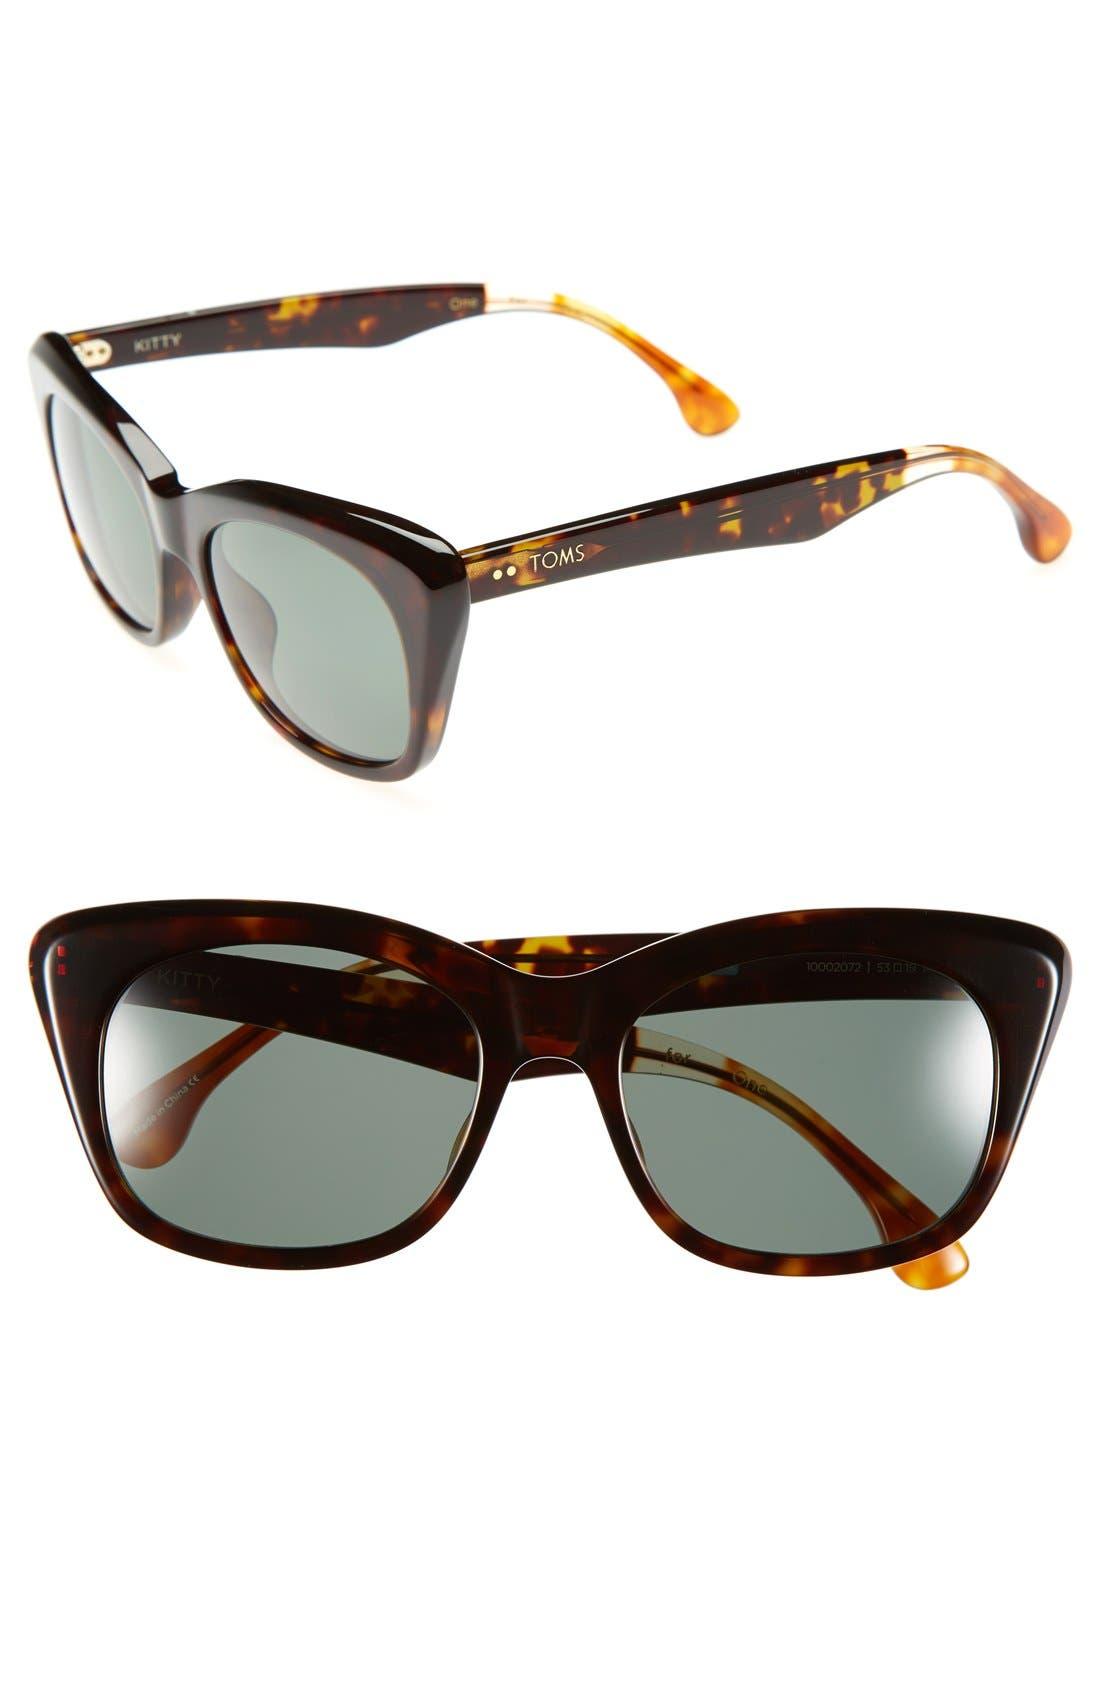 Main Image - TOMS 'Kitty' 53mm Polarized Cat Eye Sunglasses